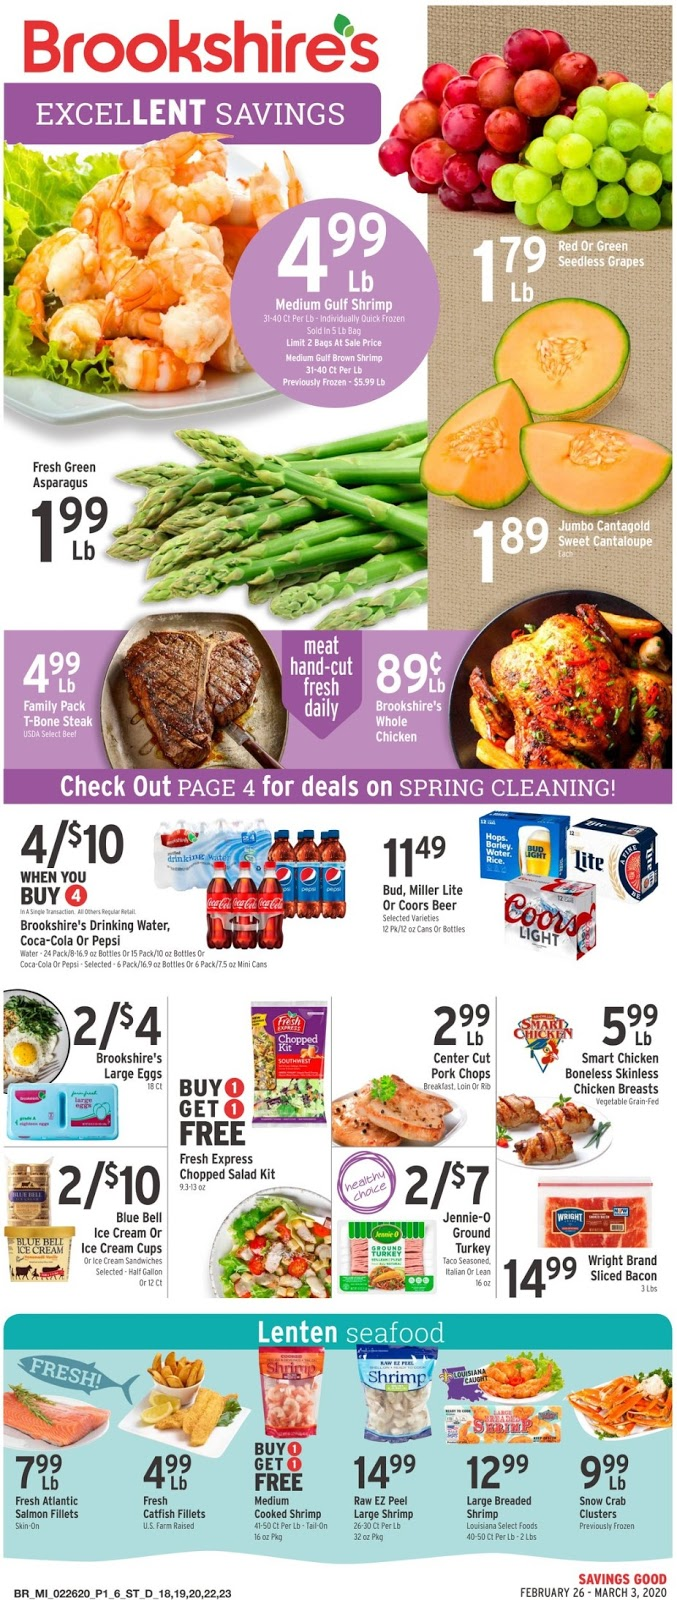 ⭐ Brookshires Ad 2/26/20 ⭐ Brookshires Weekly Ad February 26 2020